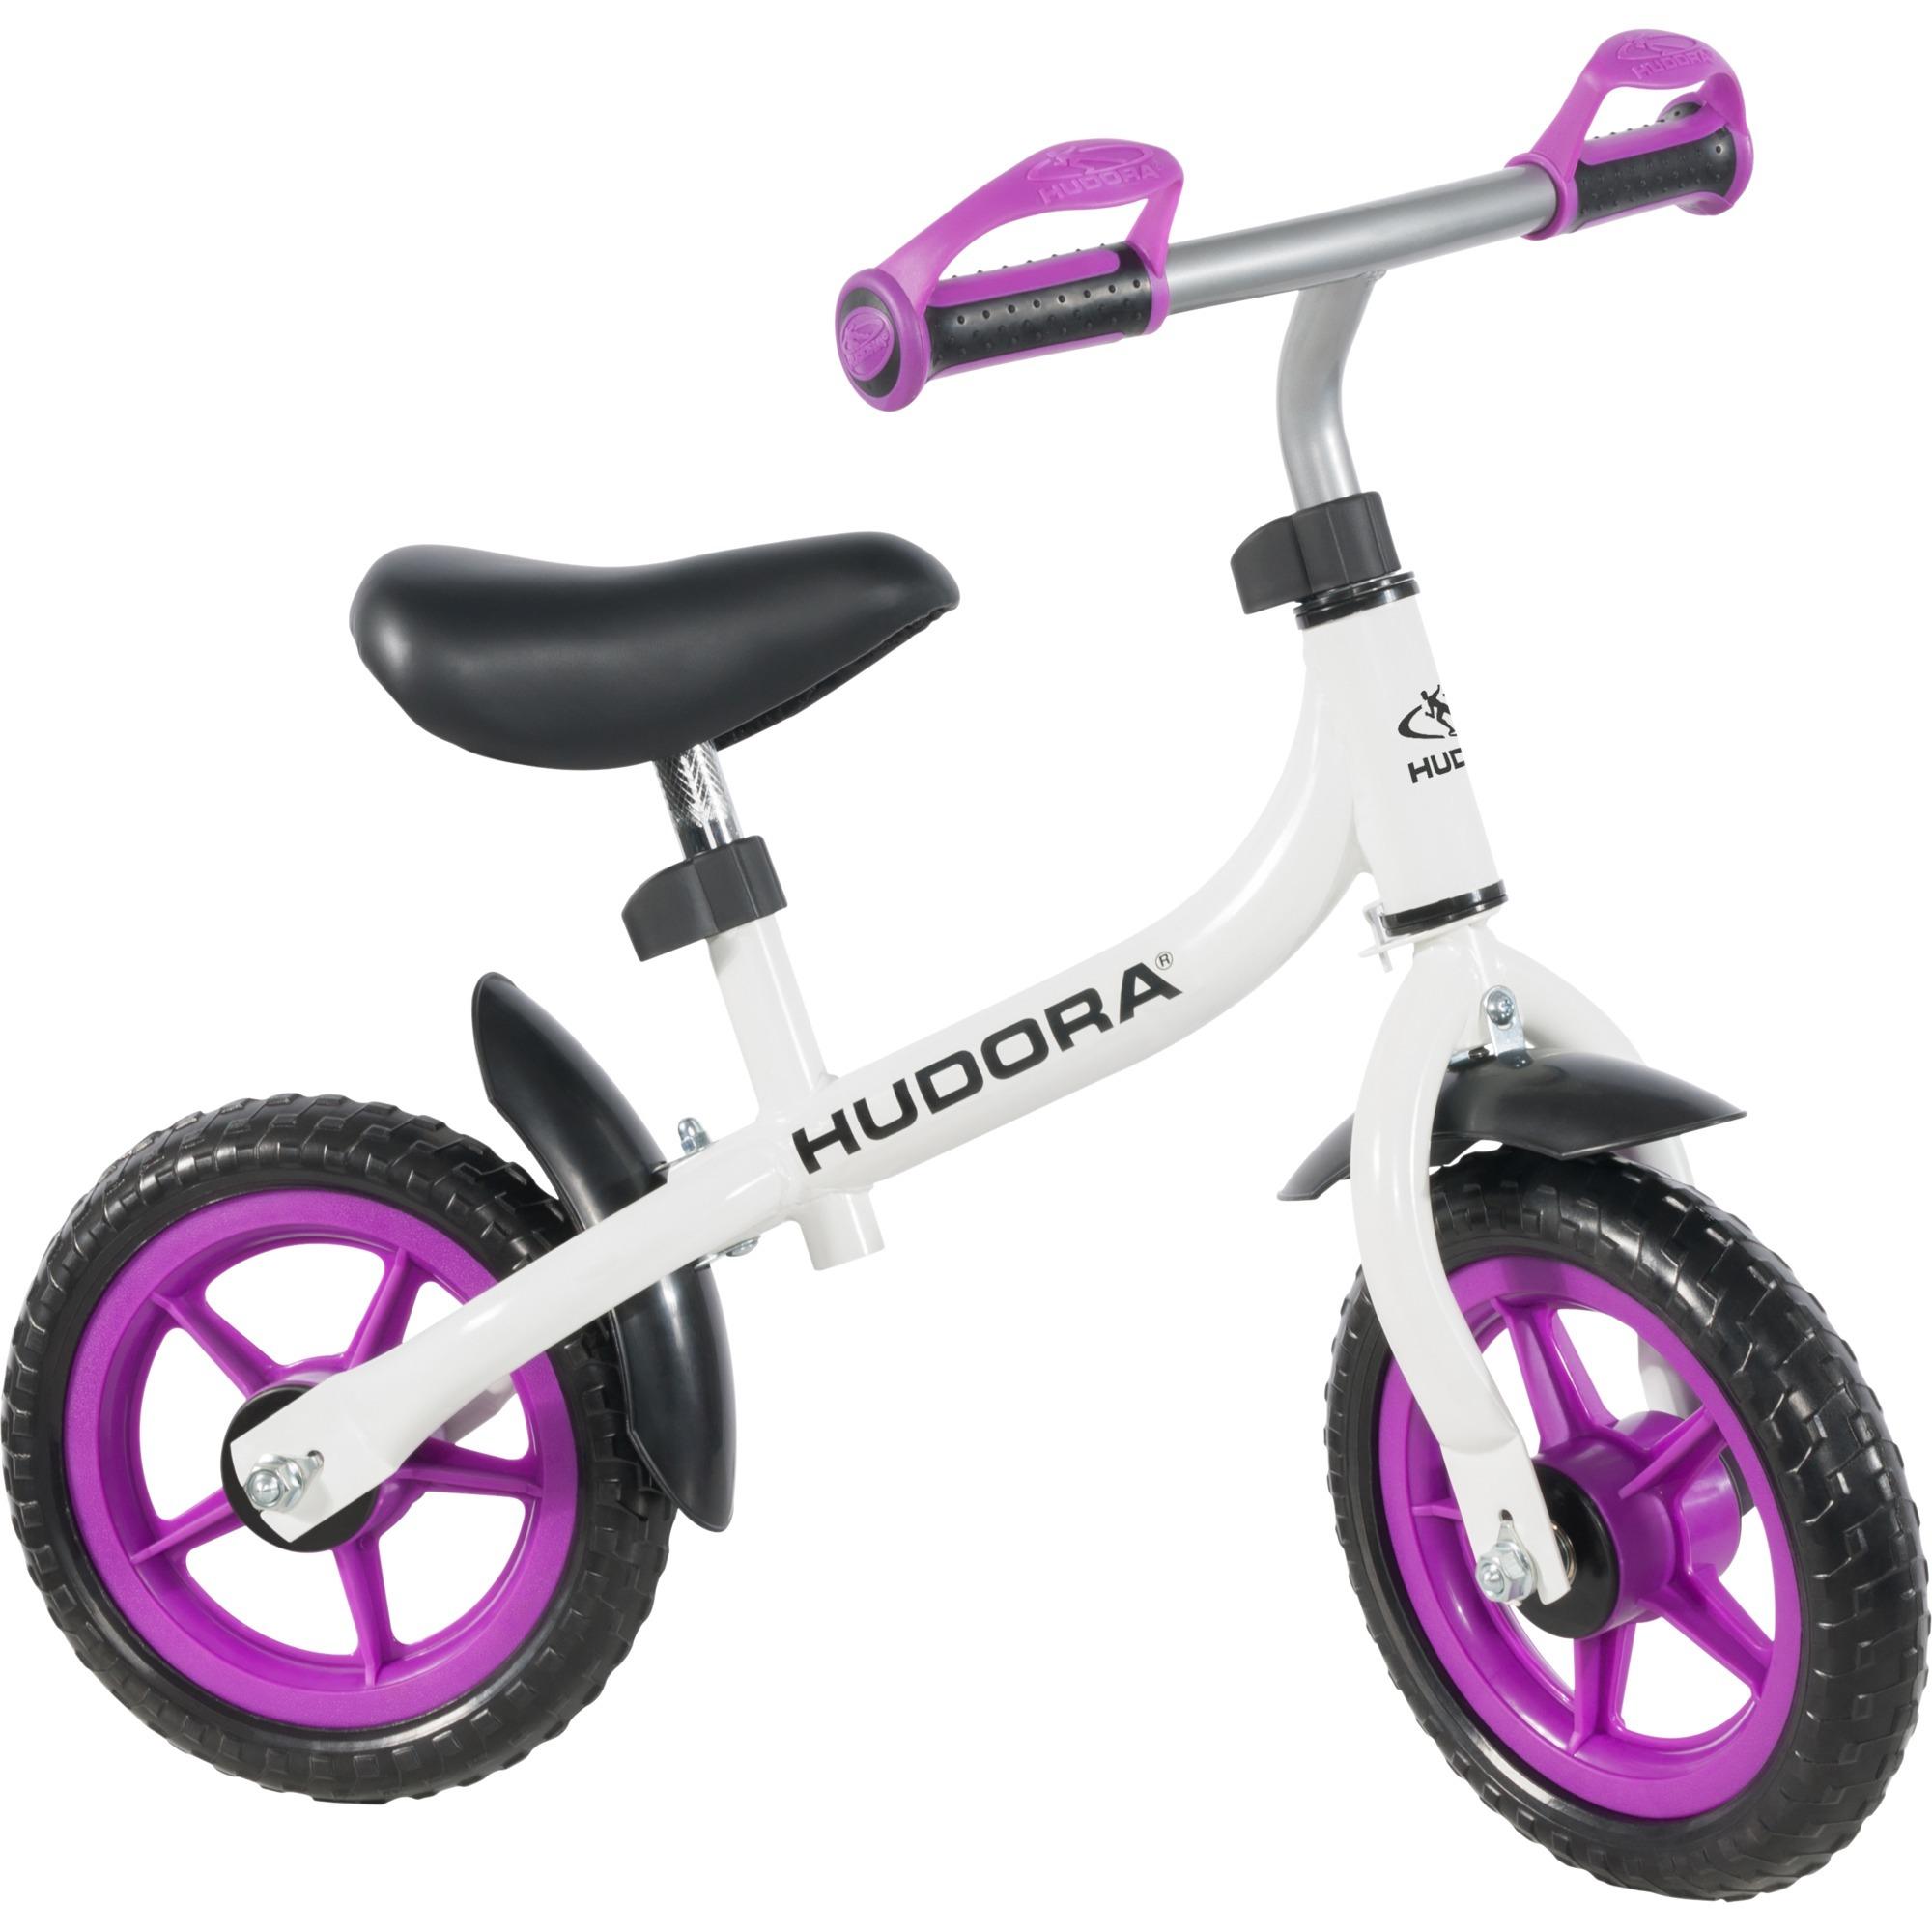 s089n-skub-cykel-born-koretoj